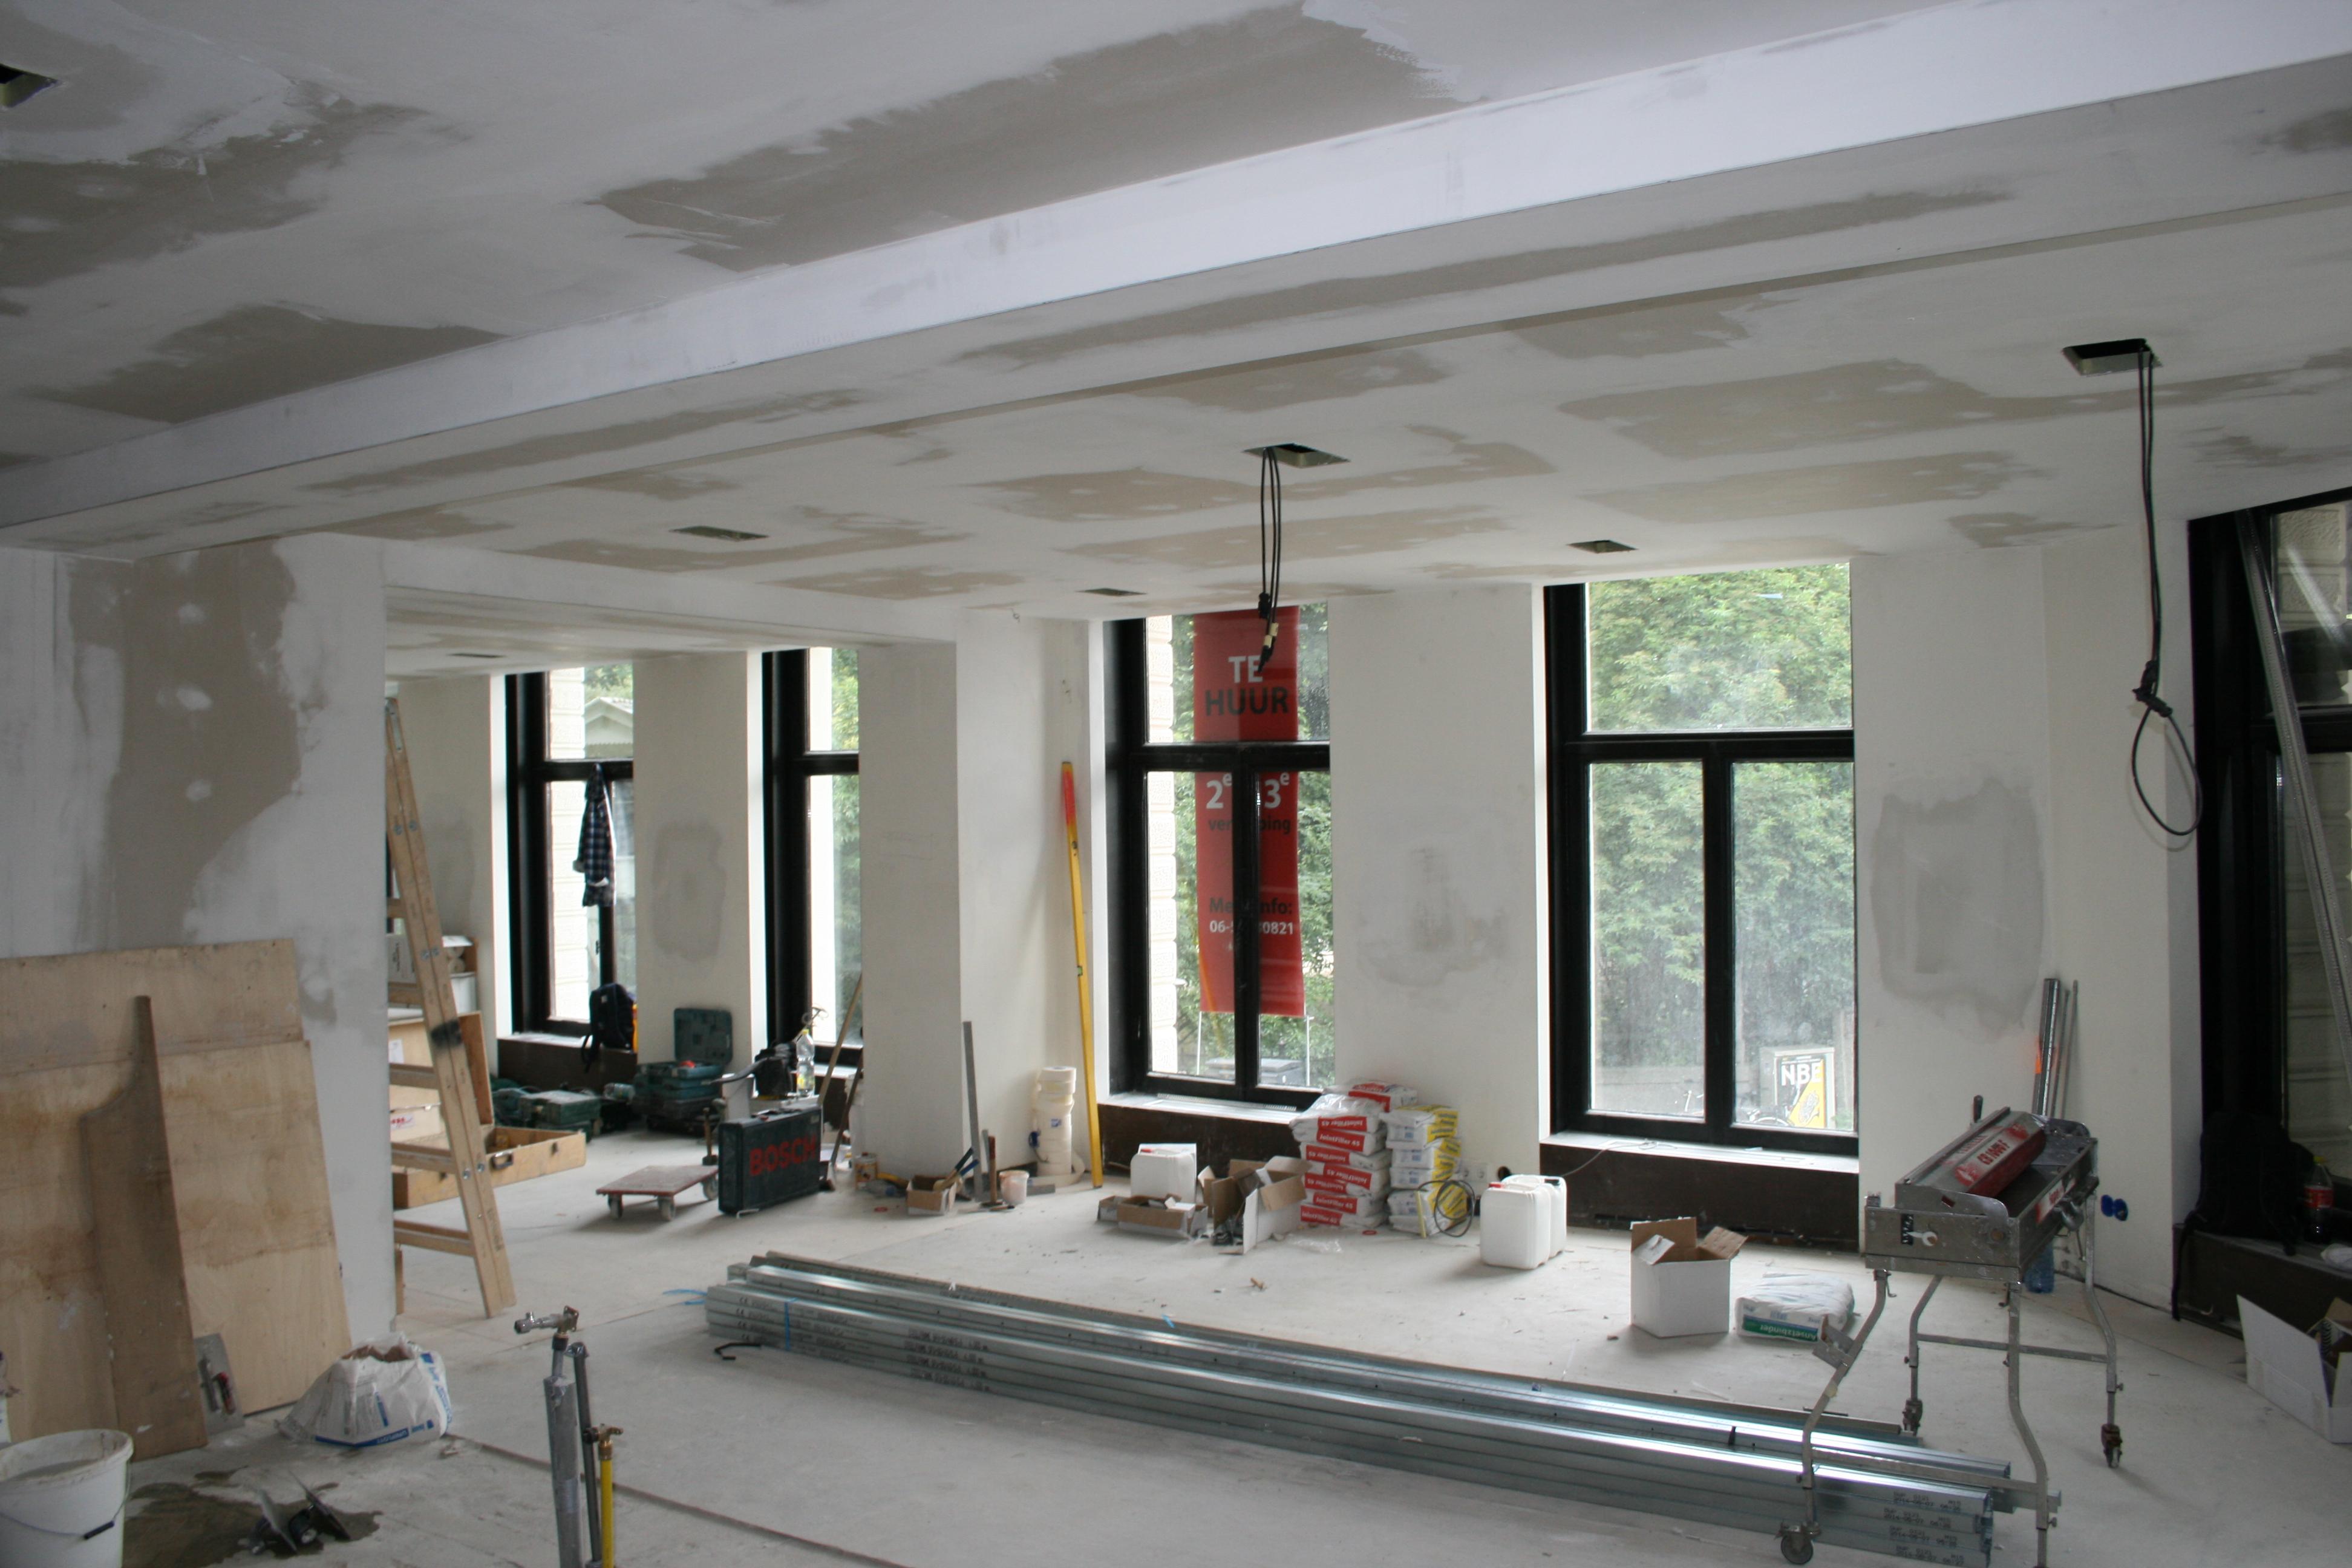 Keuken In Souterrain : Siematic brand store fotoarchief binneveld bouw & infra management